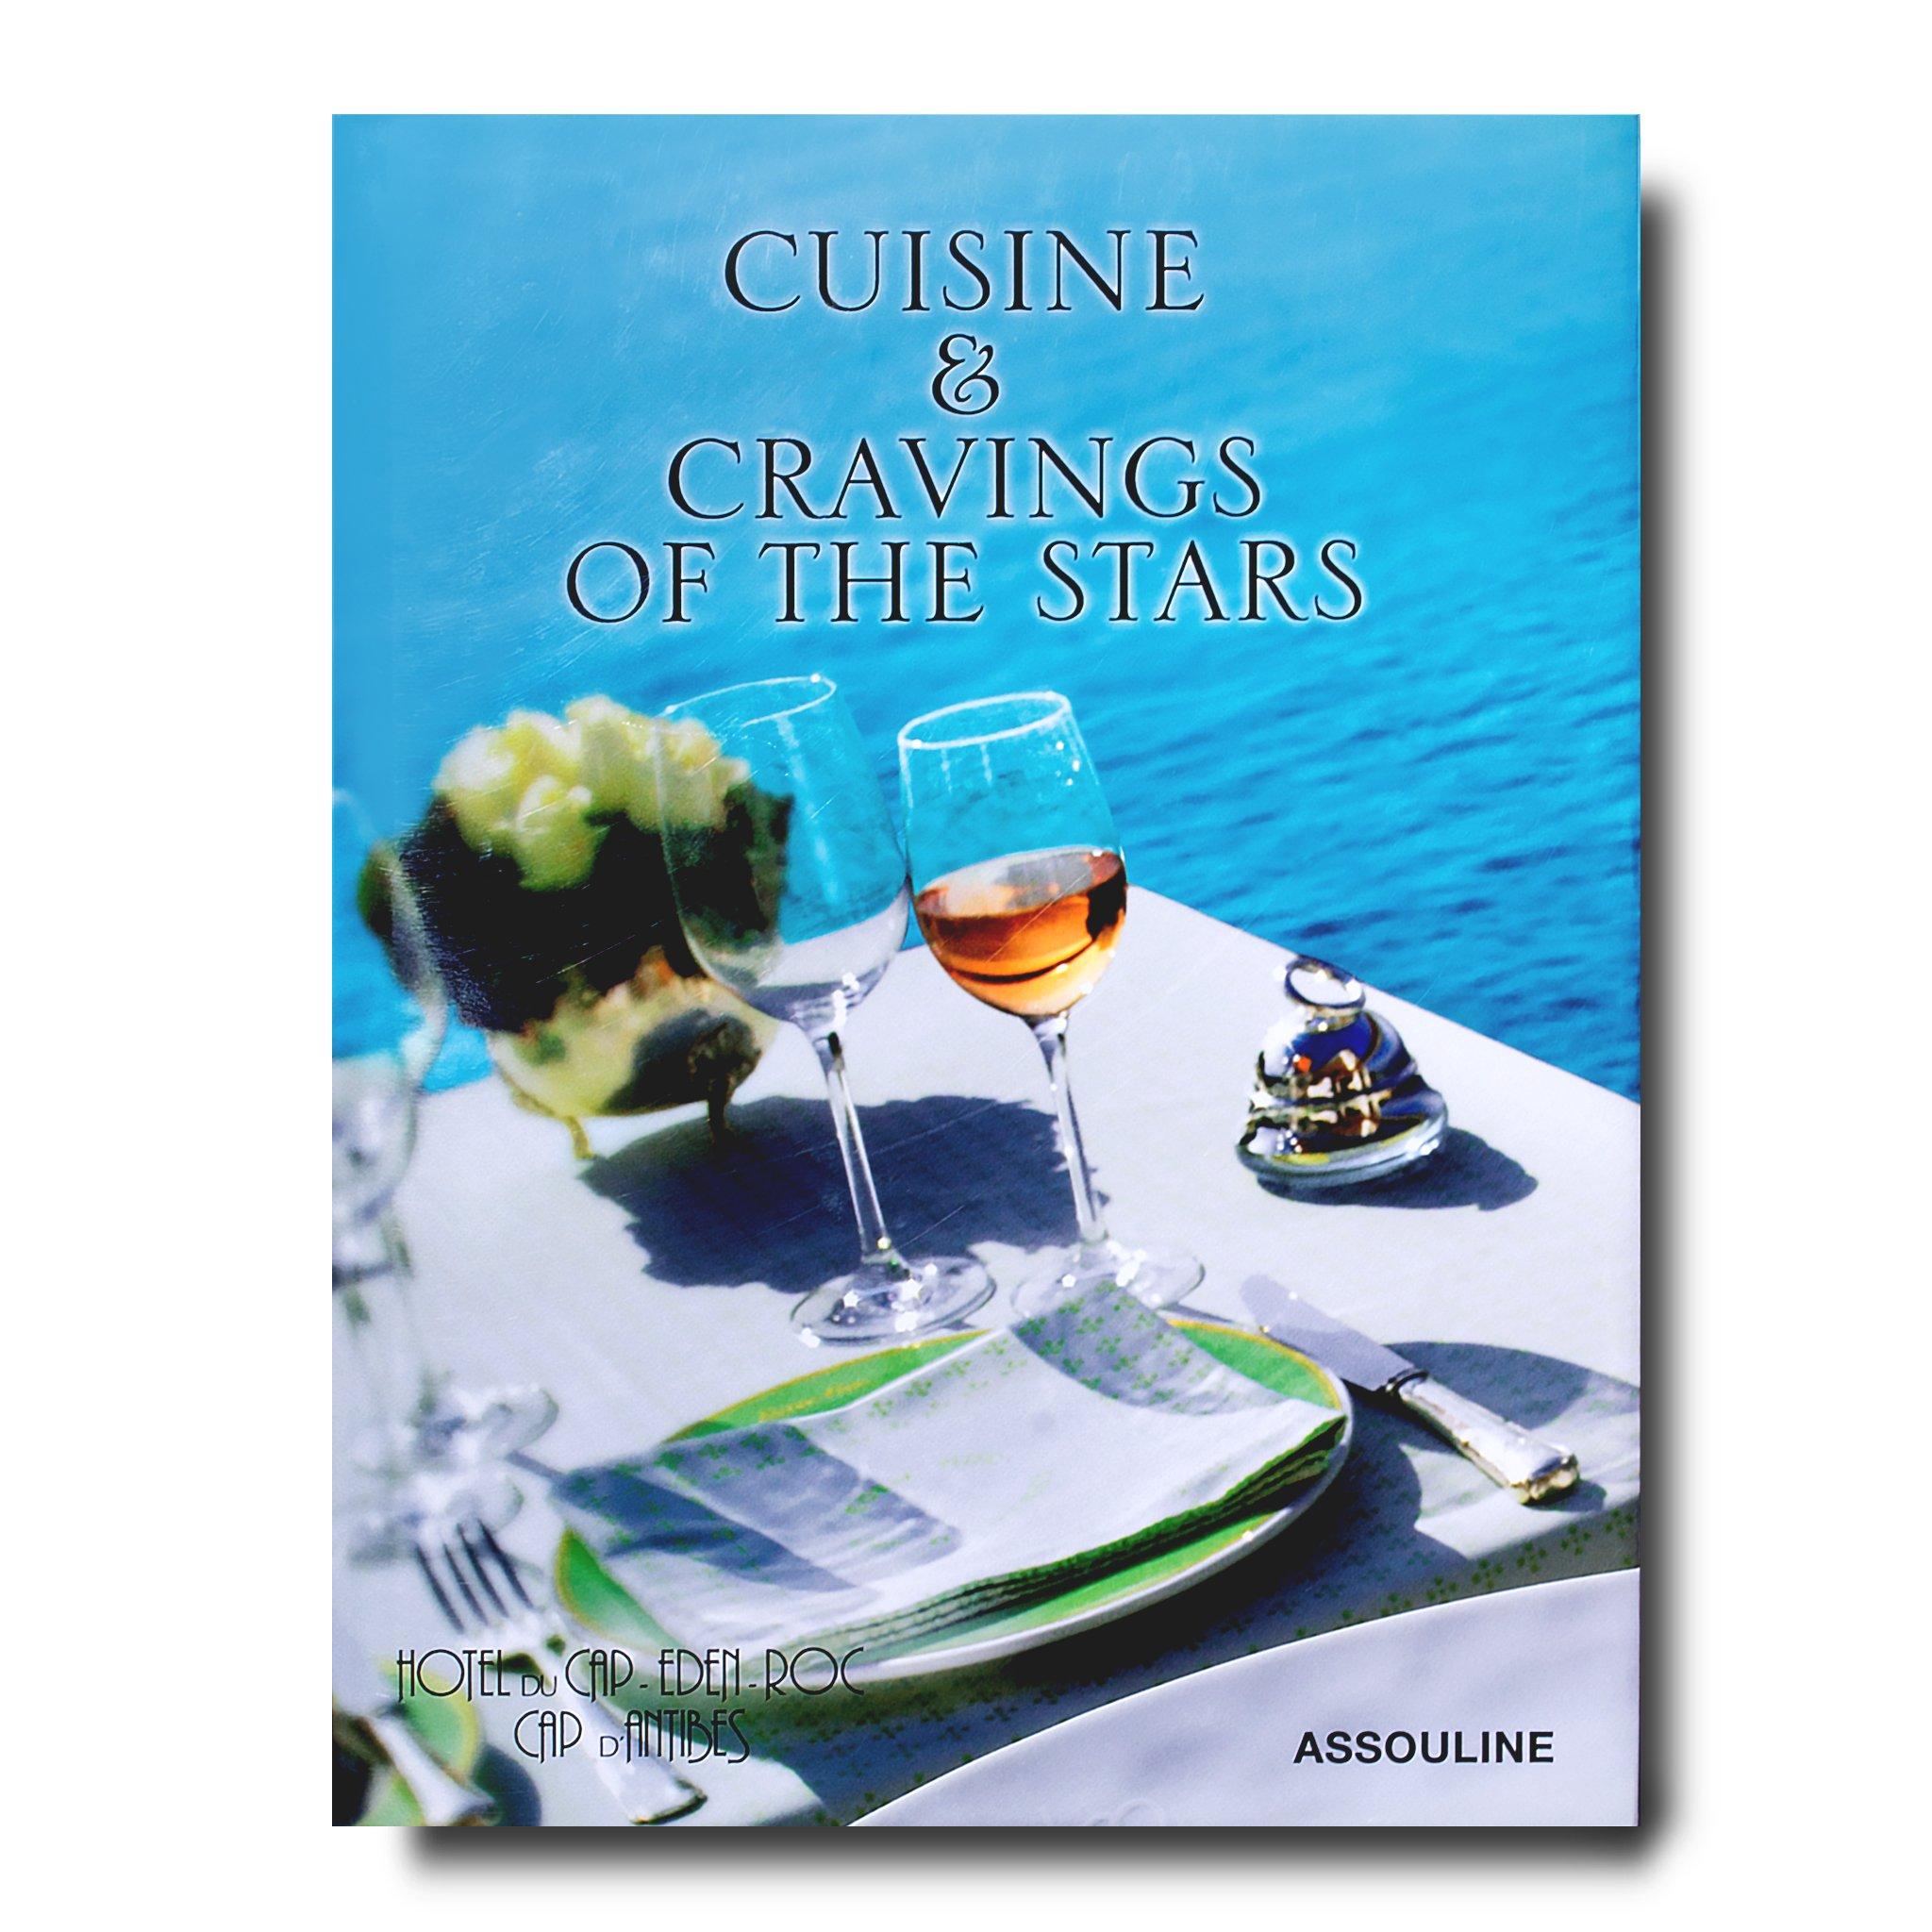 CUISINE-_-CRAVINGS-OF-THE-STARS-A_2048x.jpg